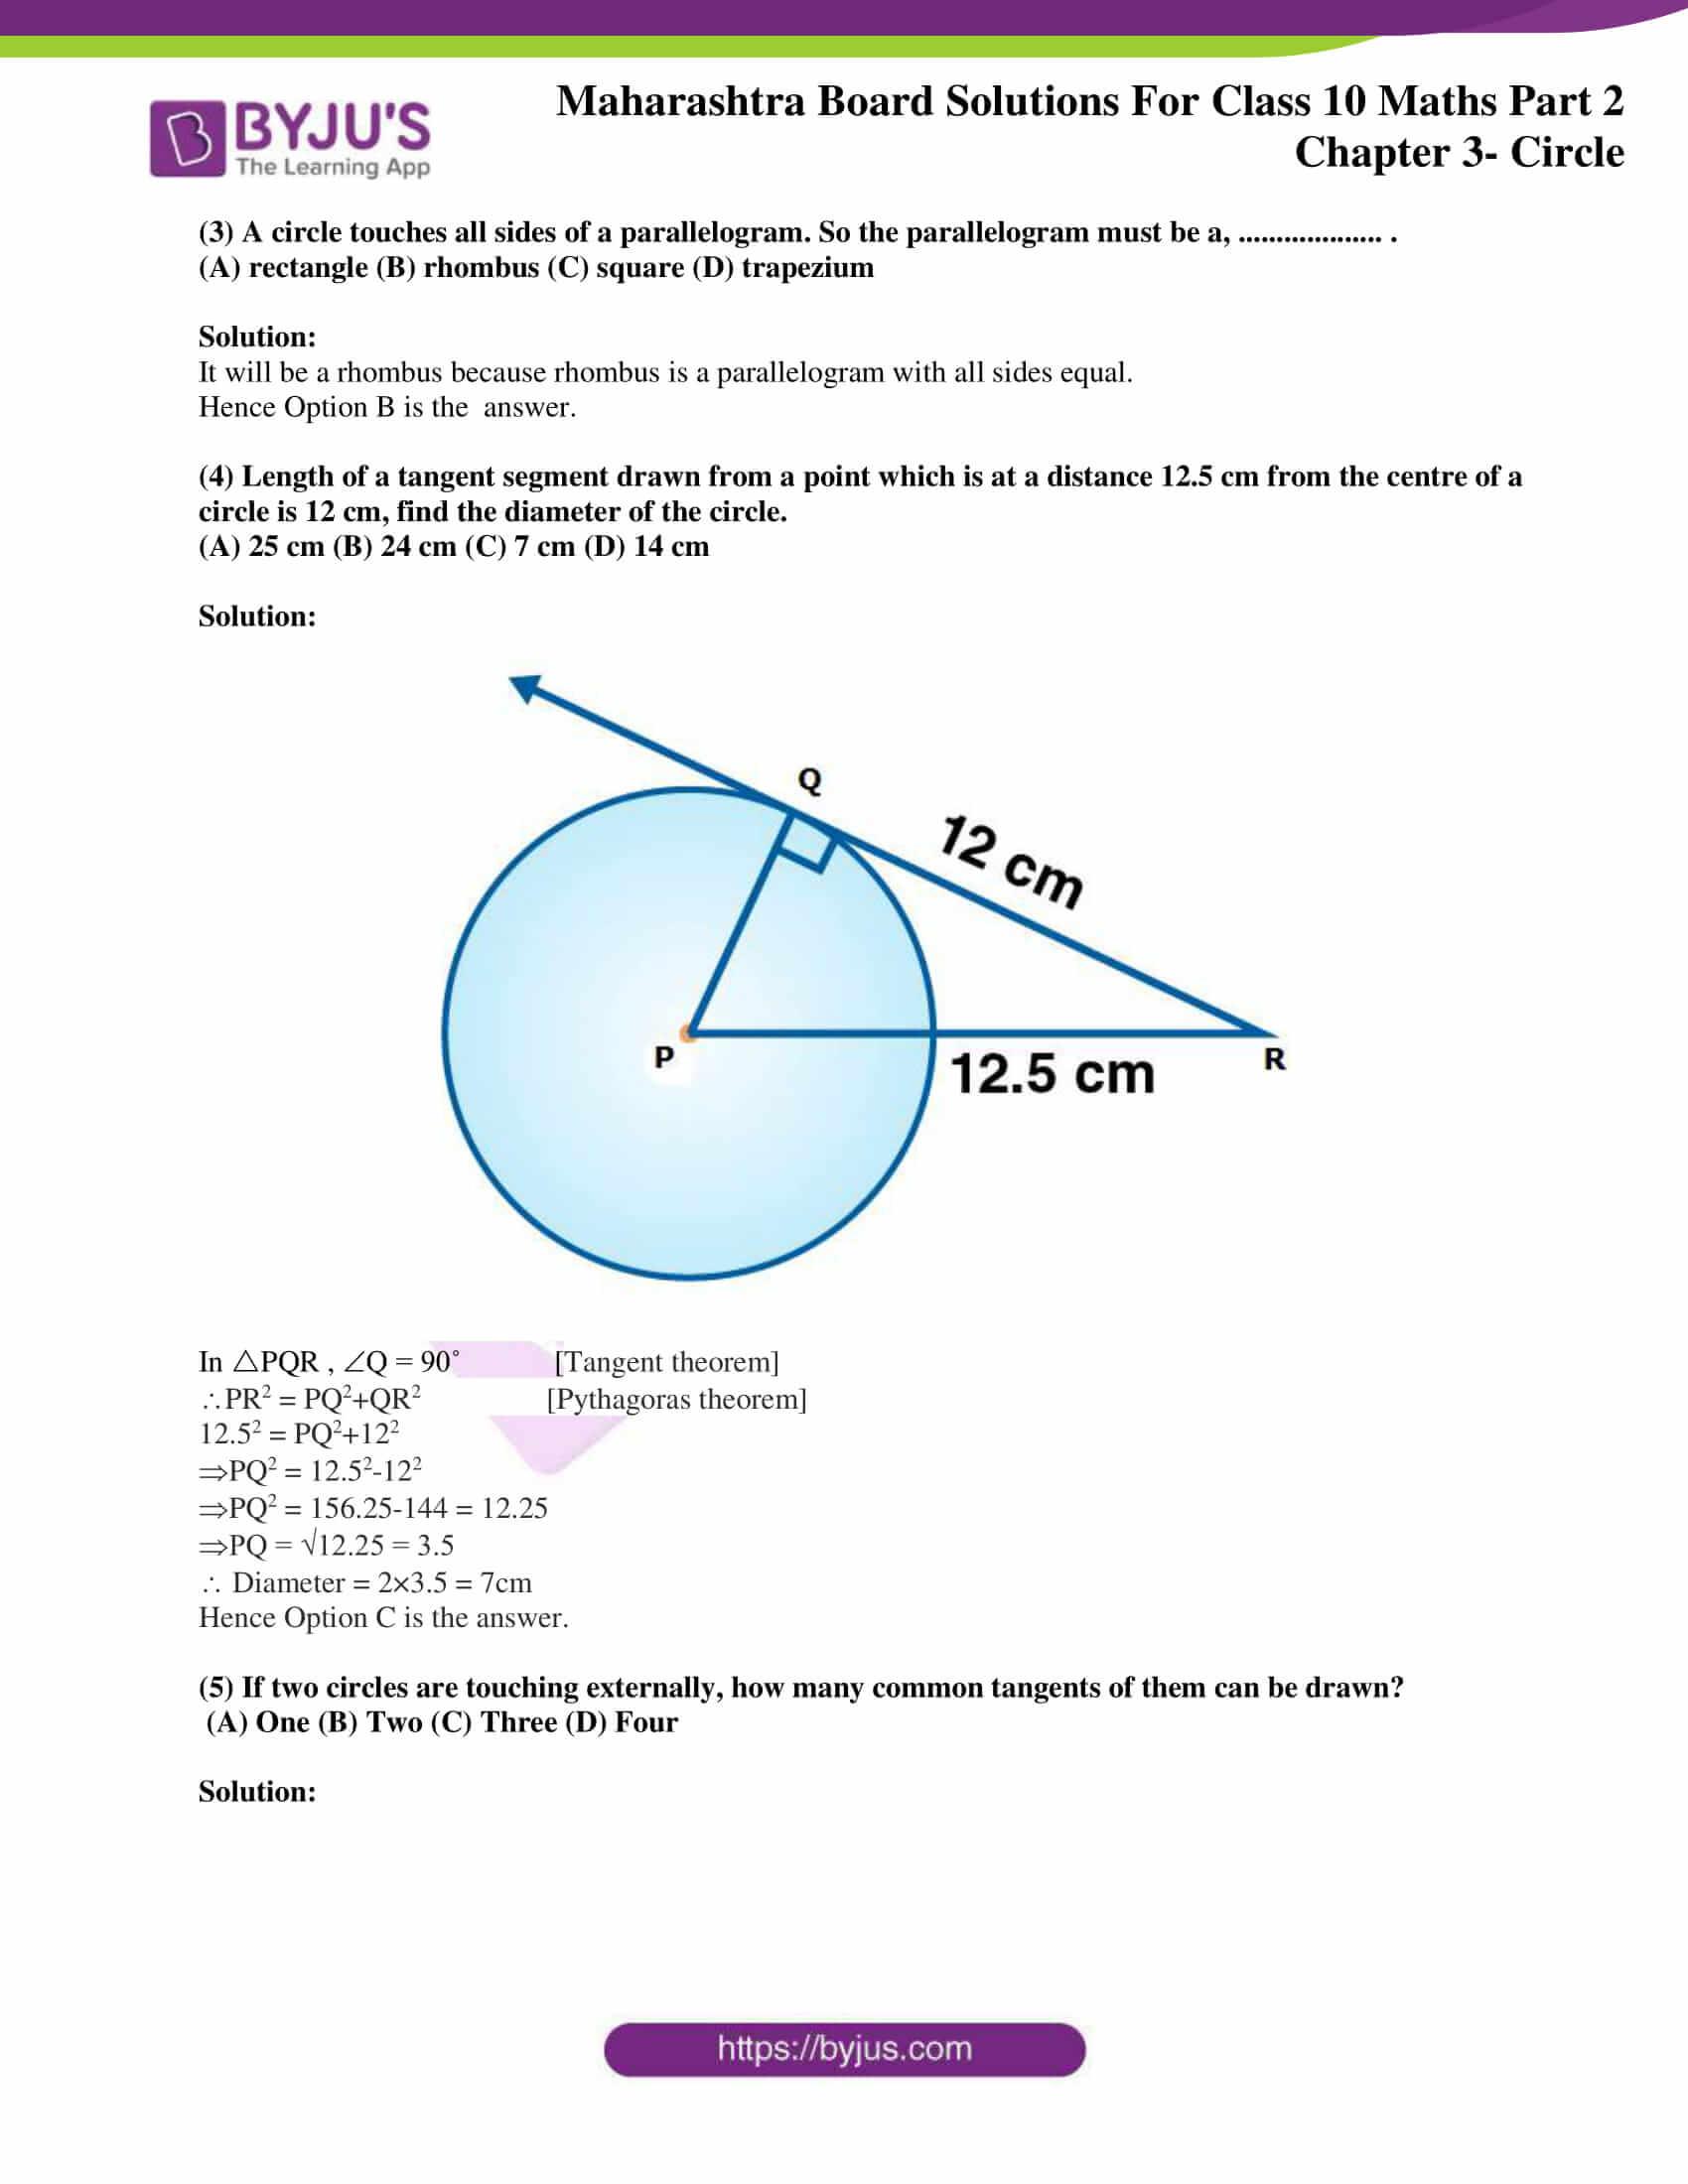 msbshse sol class 10 maths part 2 chapter 3 18